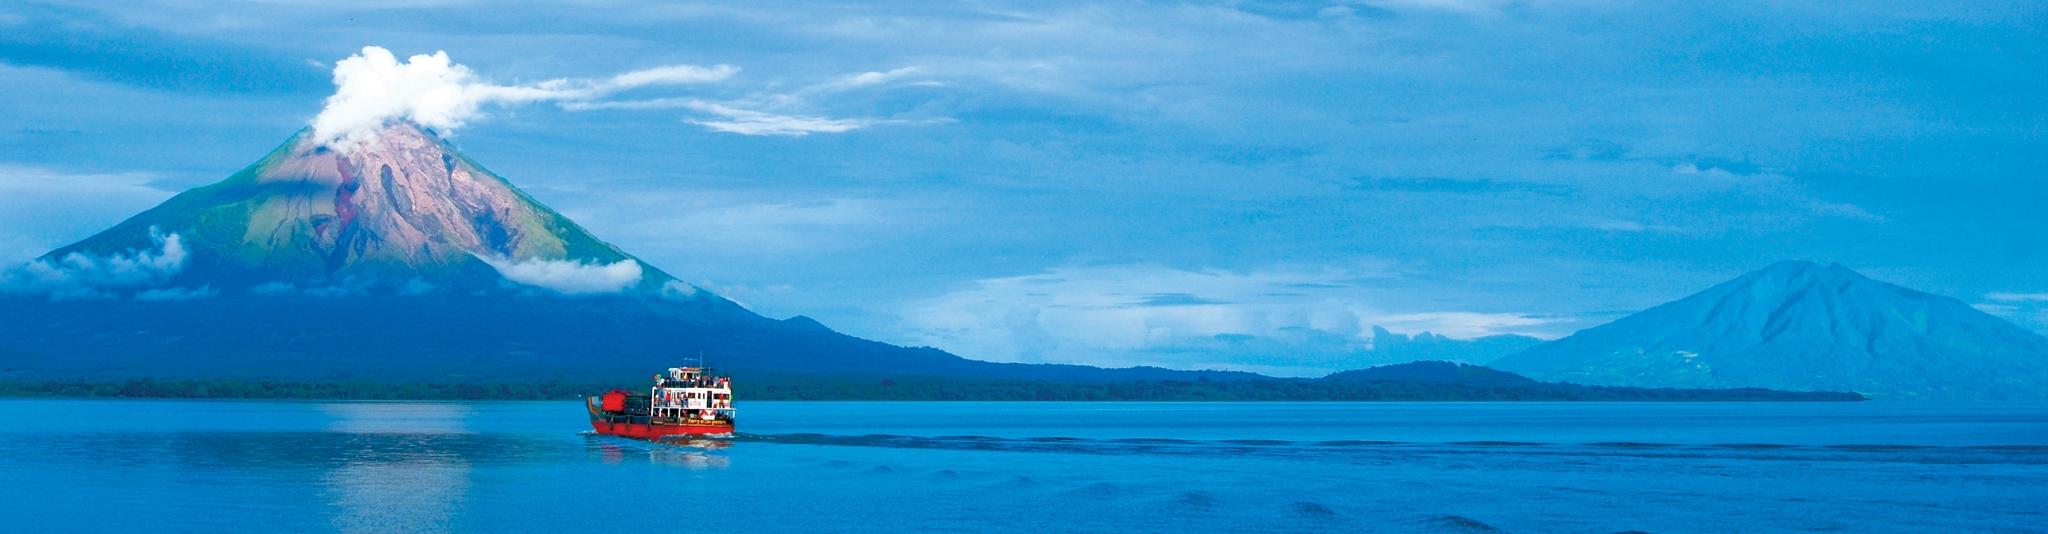 Nicaragua01.jpg